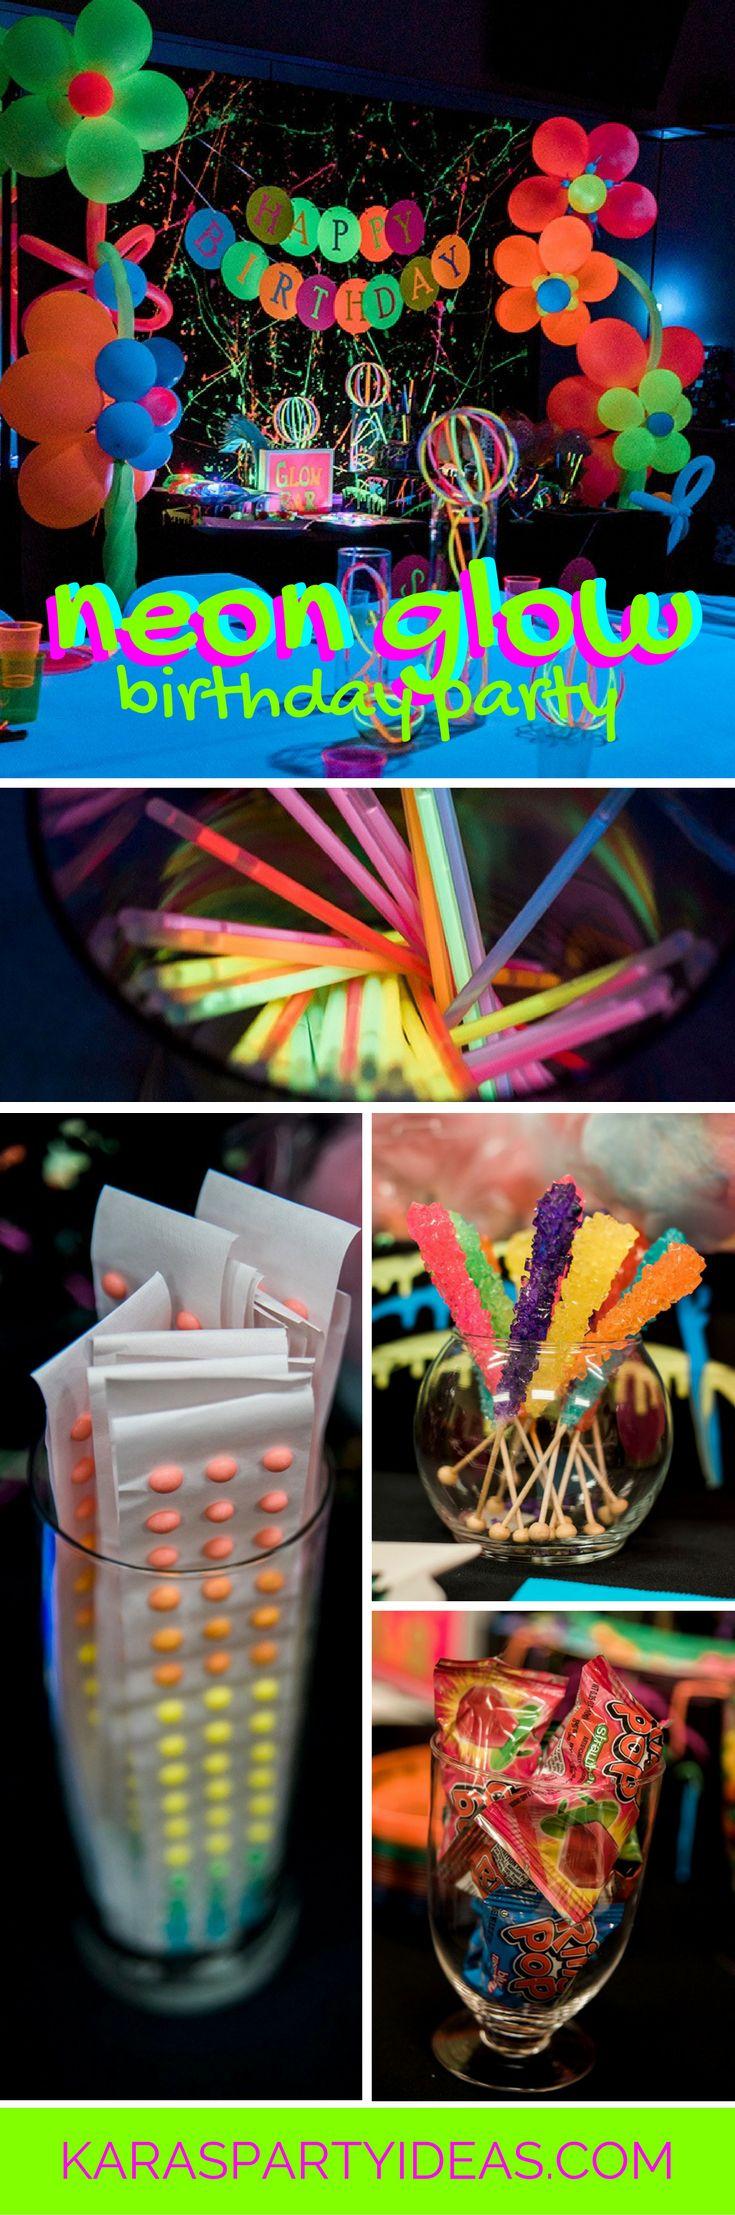 Neon Glow Birthday Party via Kara's Party Ideas | KarasPartyIdeas.com